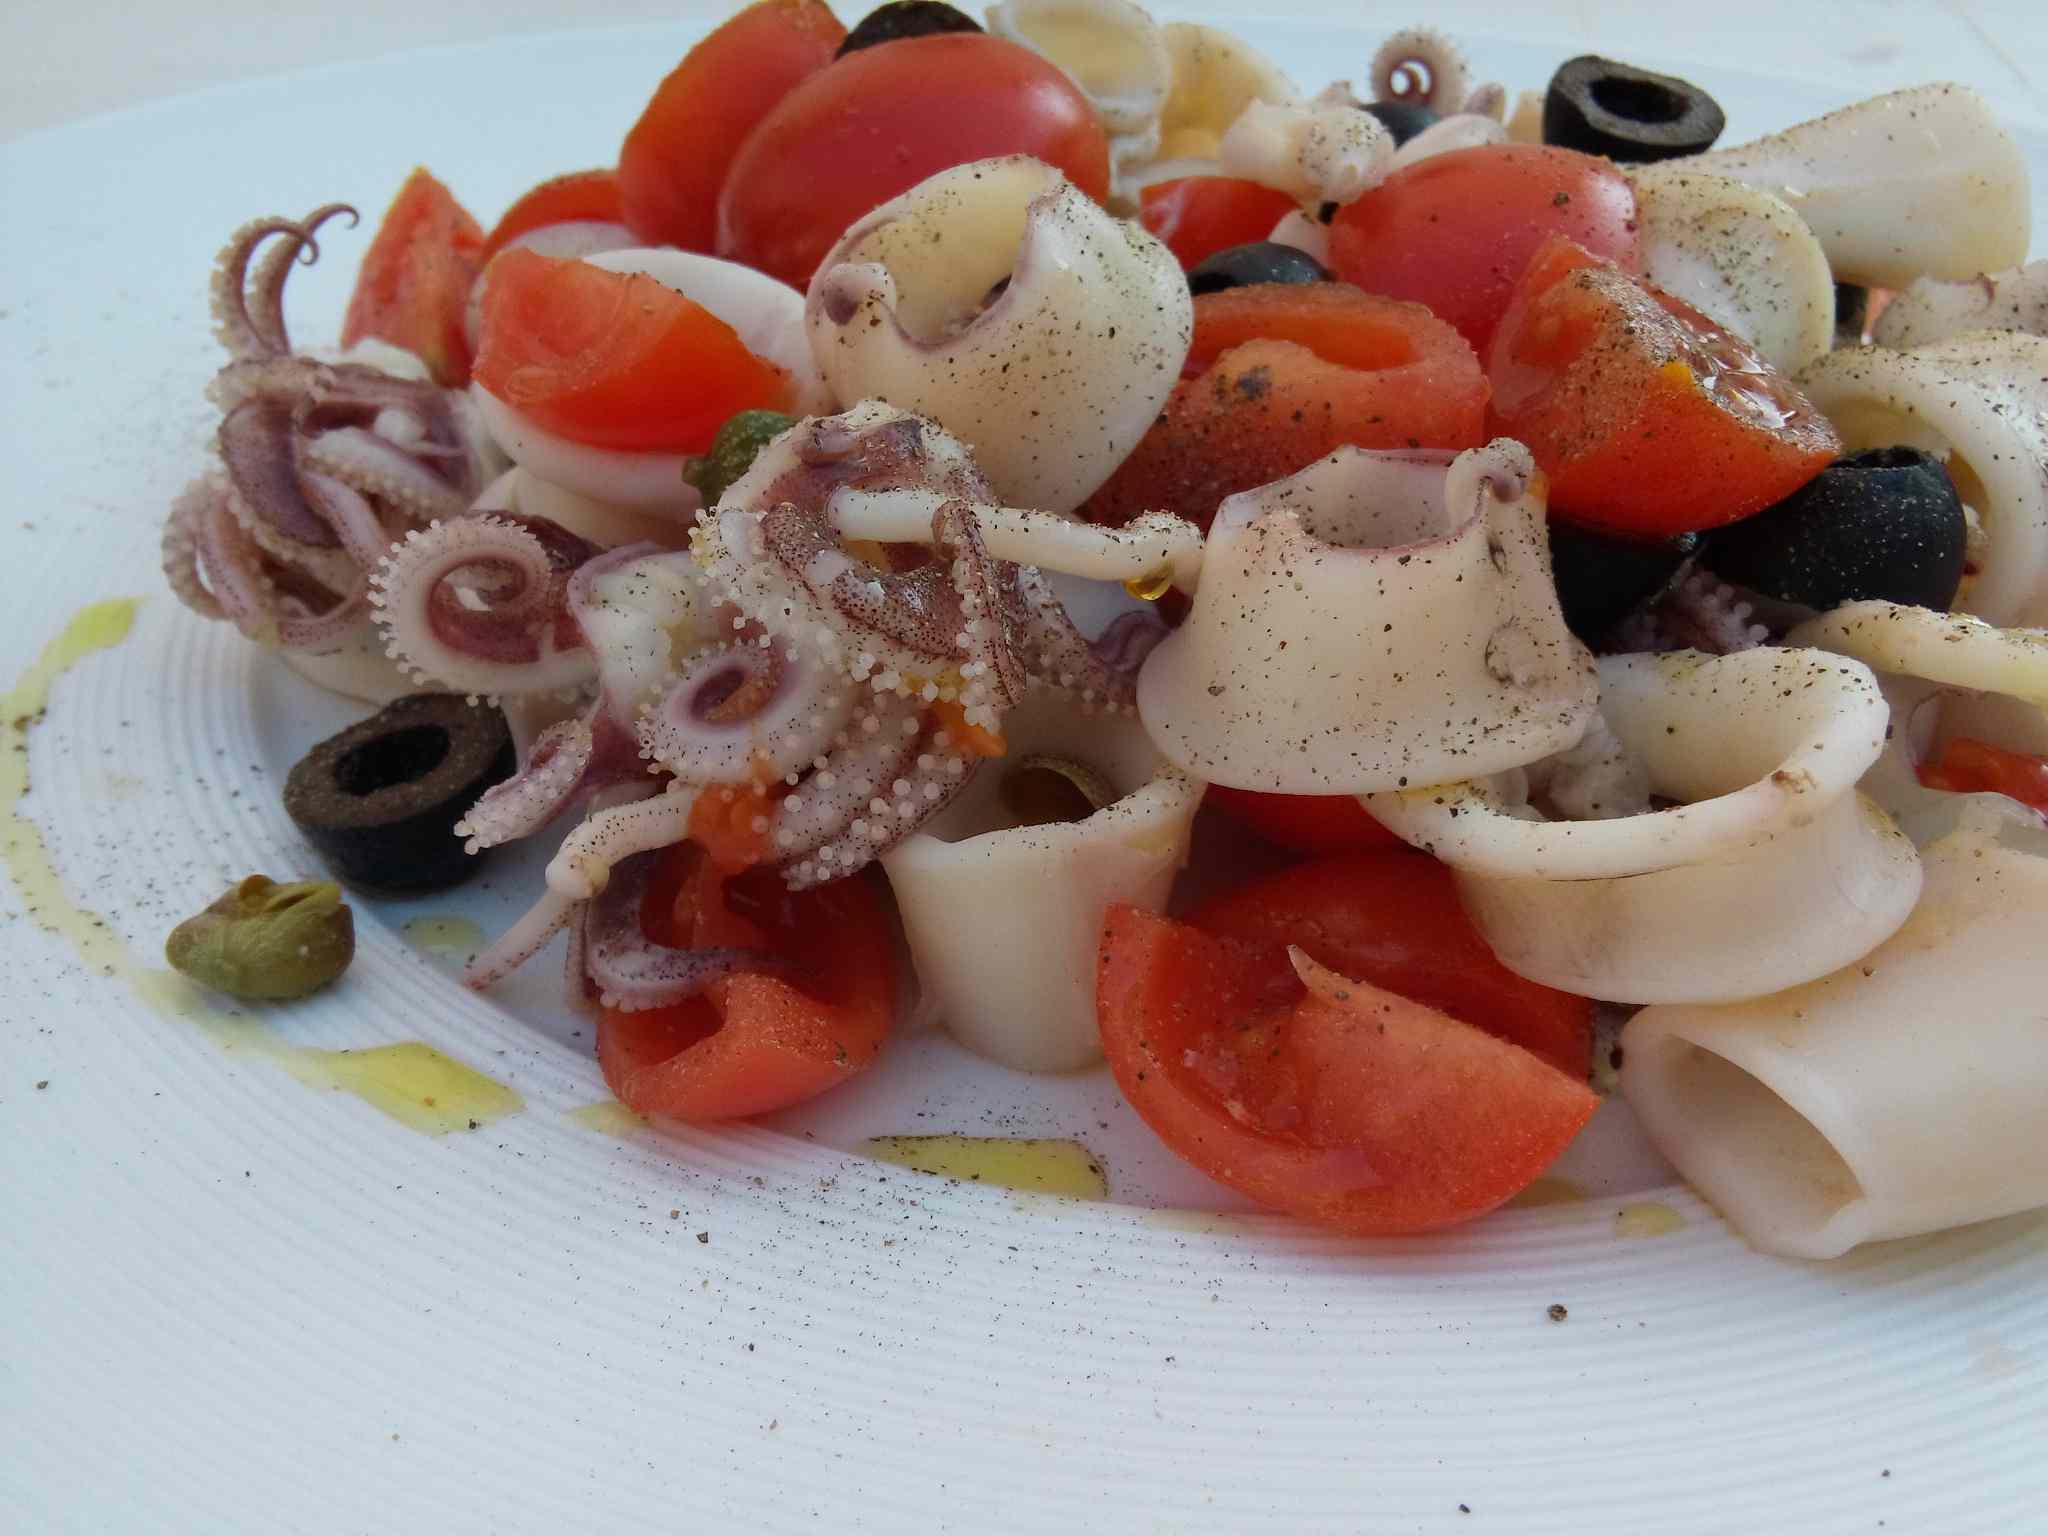 Insalata di calamari, pomodorini, capperi ed olive